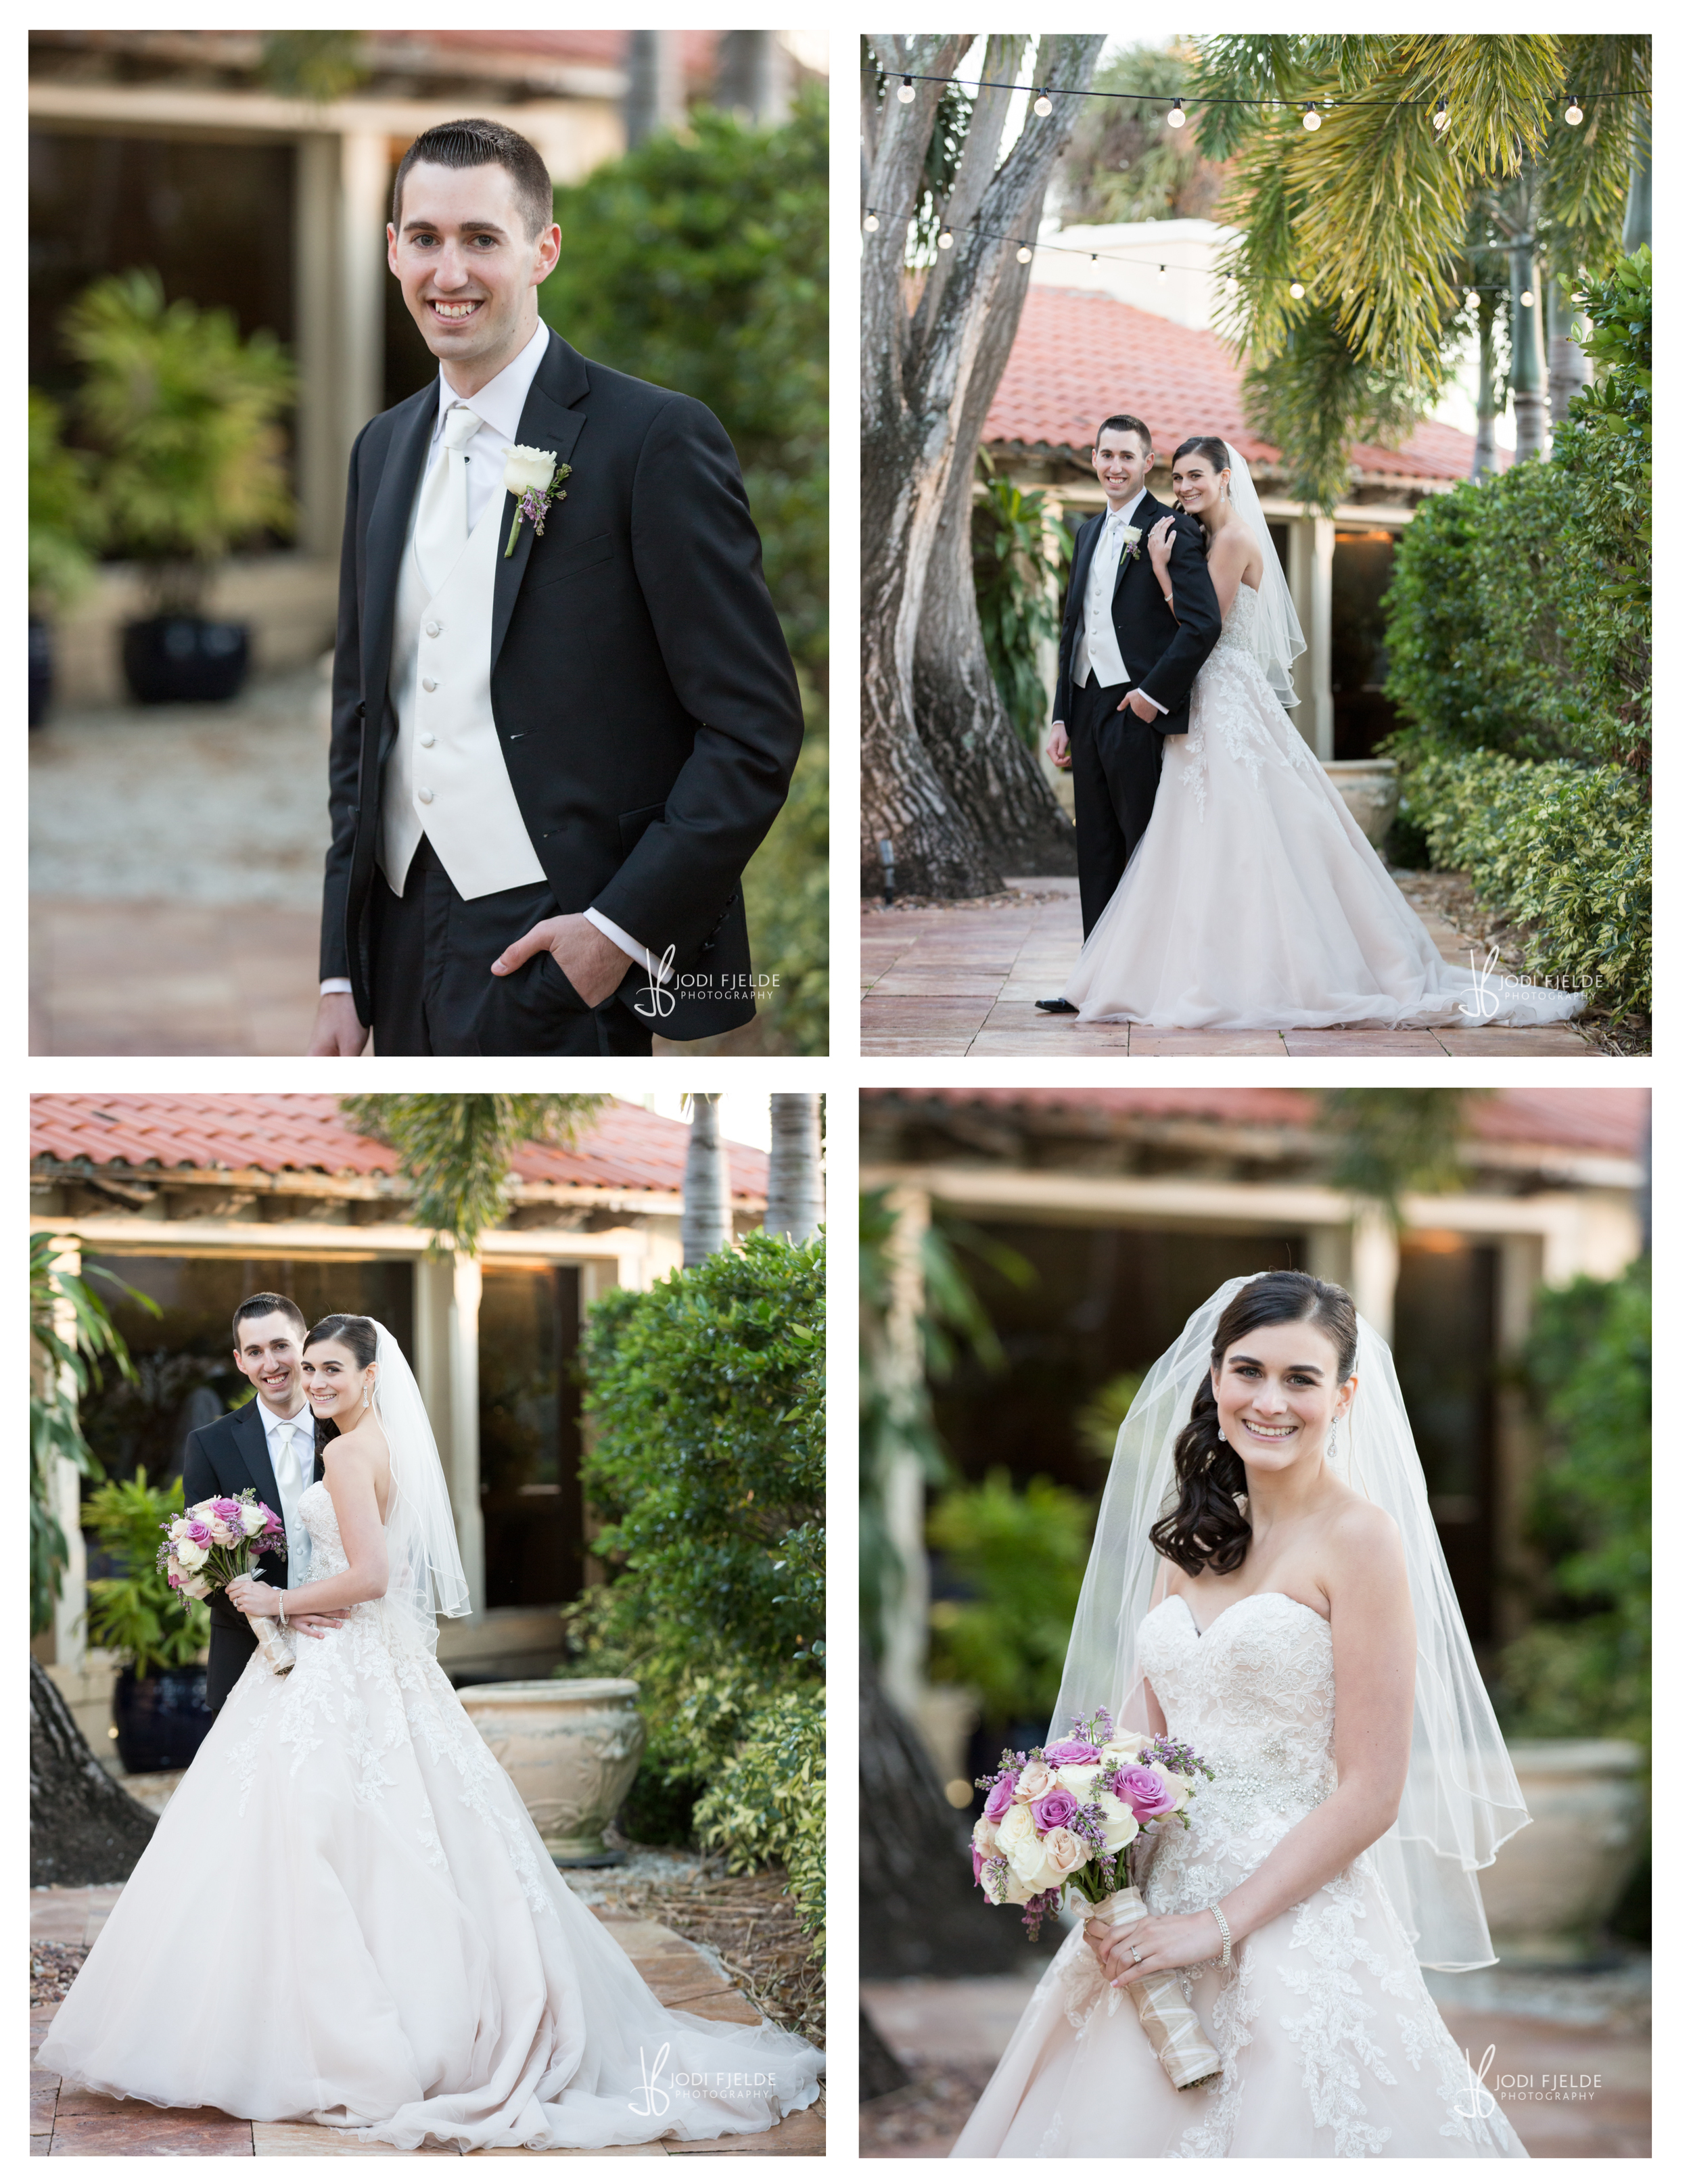 Benvenuto_Palm_Beach_Wedding_Jewish_Michelle & Jason_Jodi_Fjedle_Photography 33.jpg